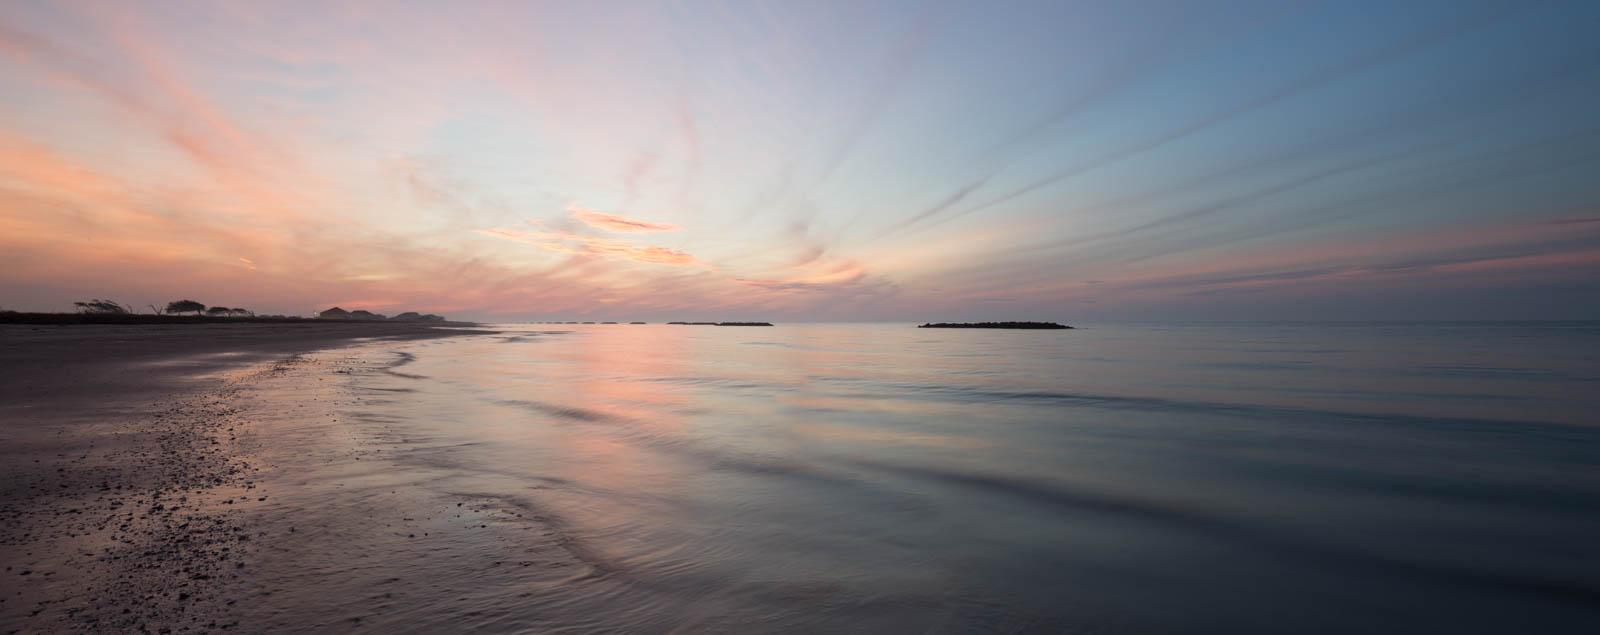 peveto_beach_sunrise01